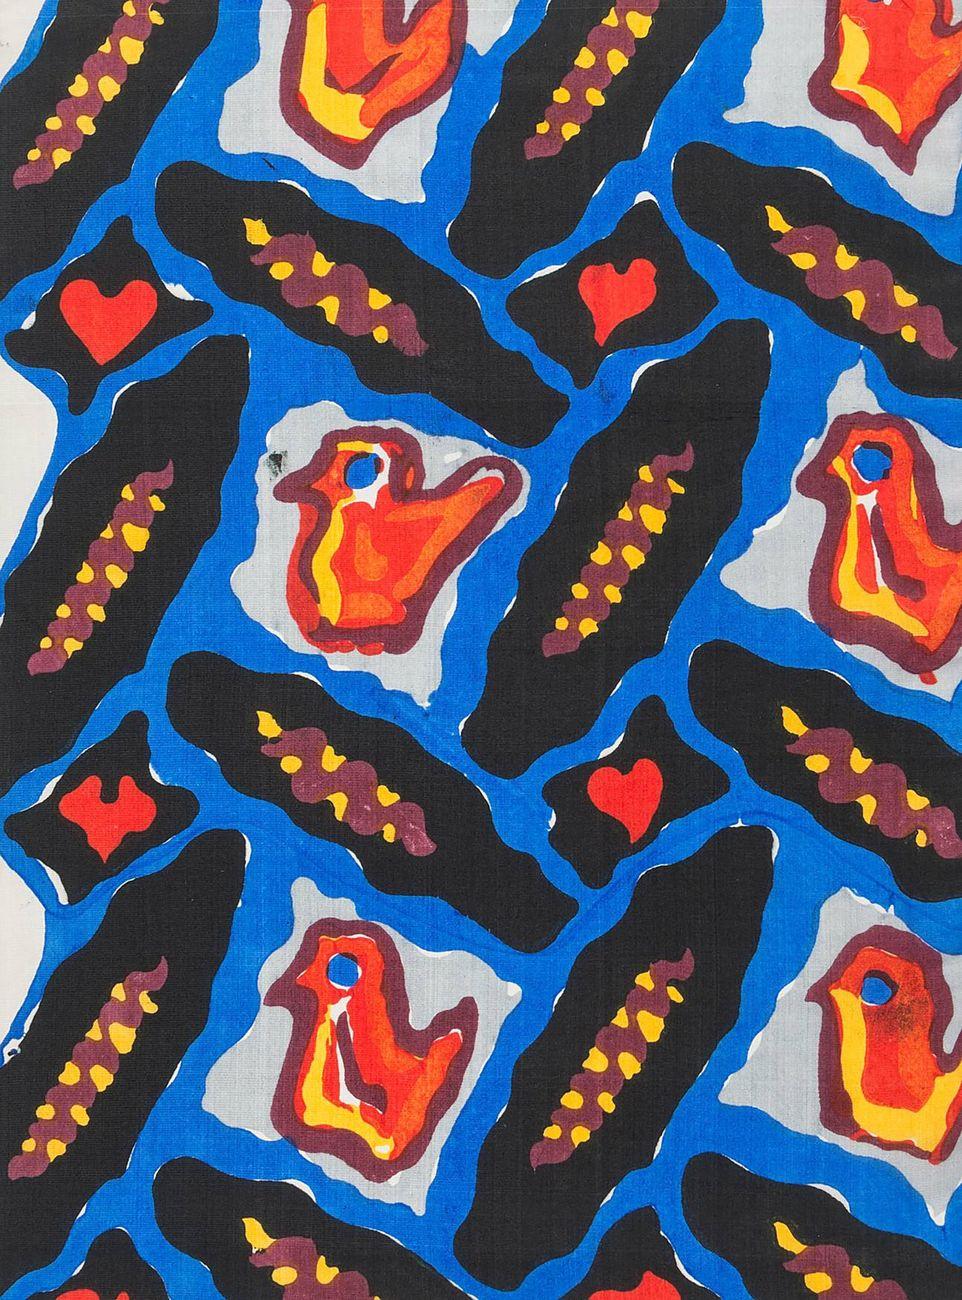 Rose Krenn, WW fabric pattern Backfisch [Teenage Girl], 1910 11 © MAK, Kristina Wissik